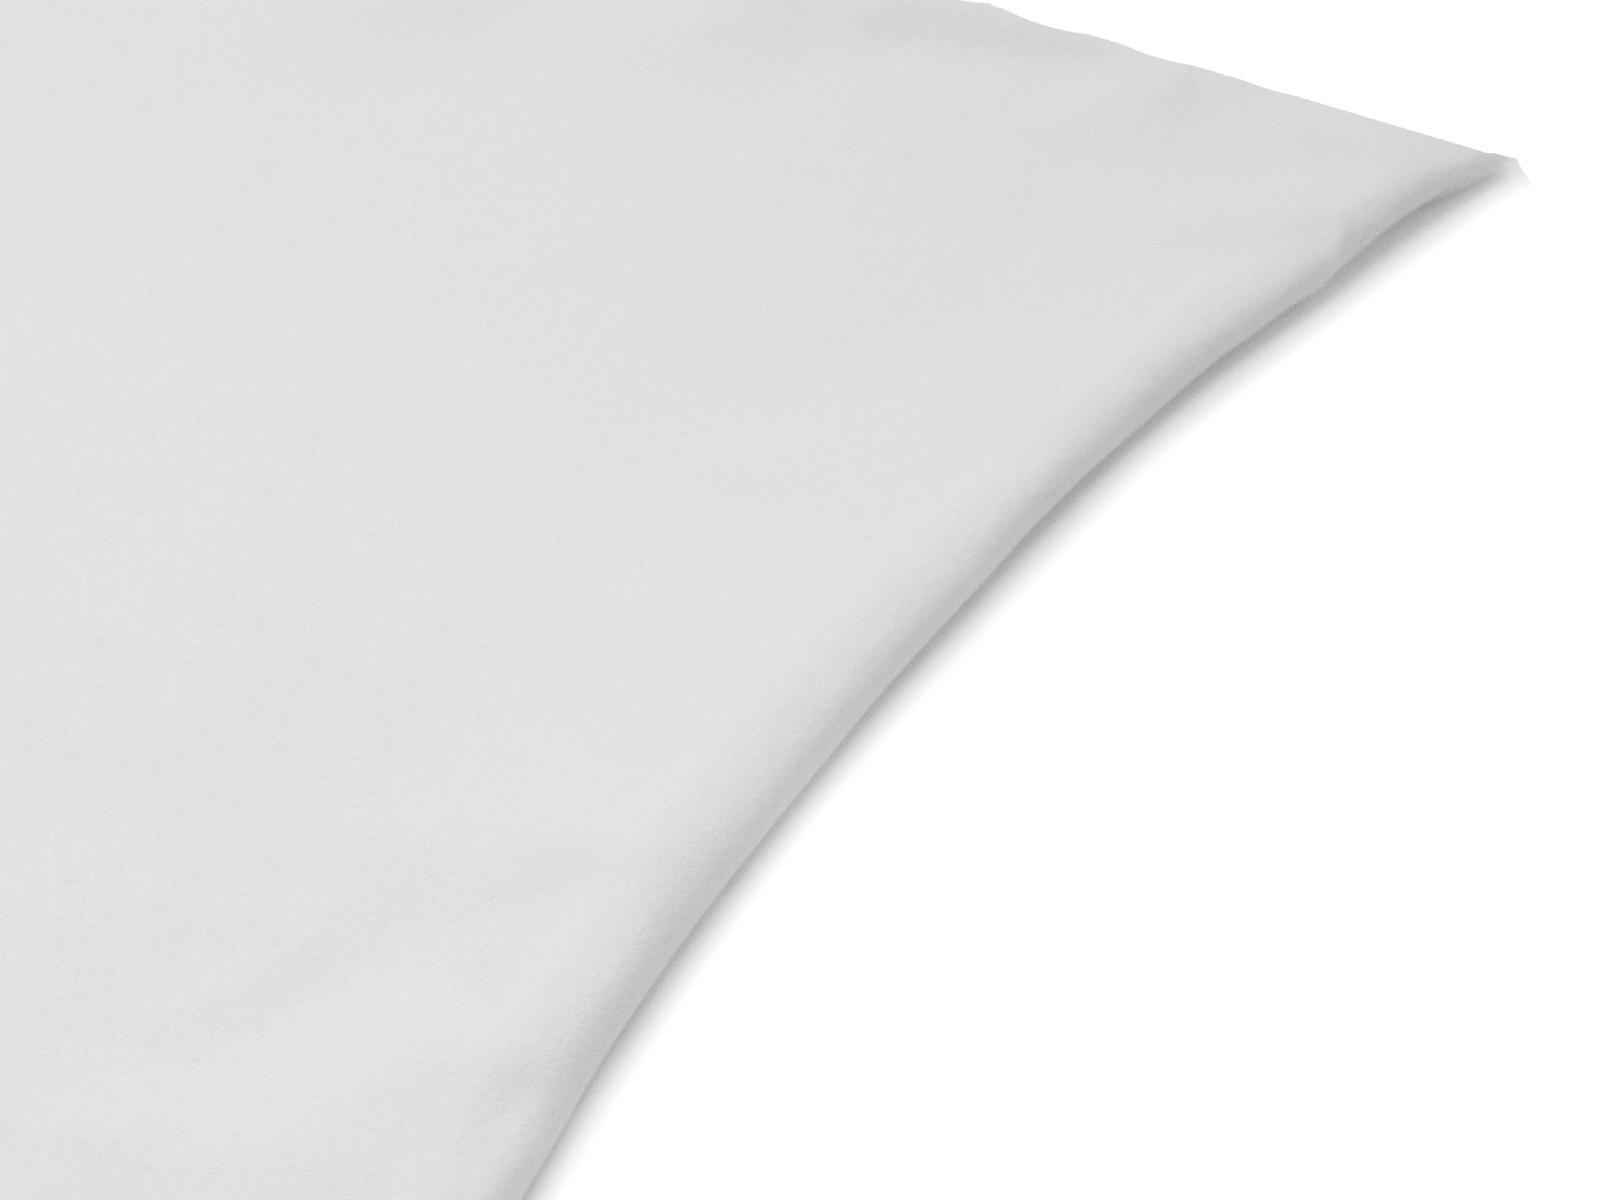 ESPANDERE BATC1W Trusscover 1m bianco